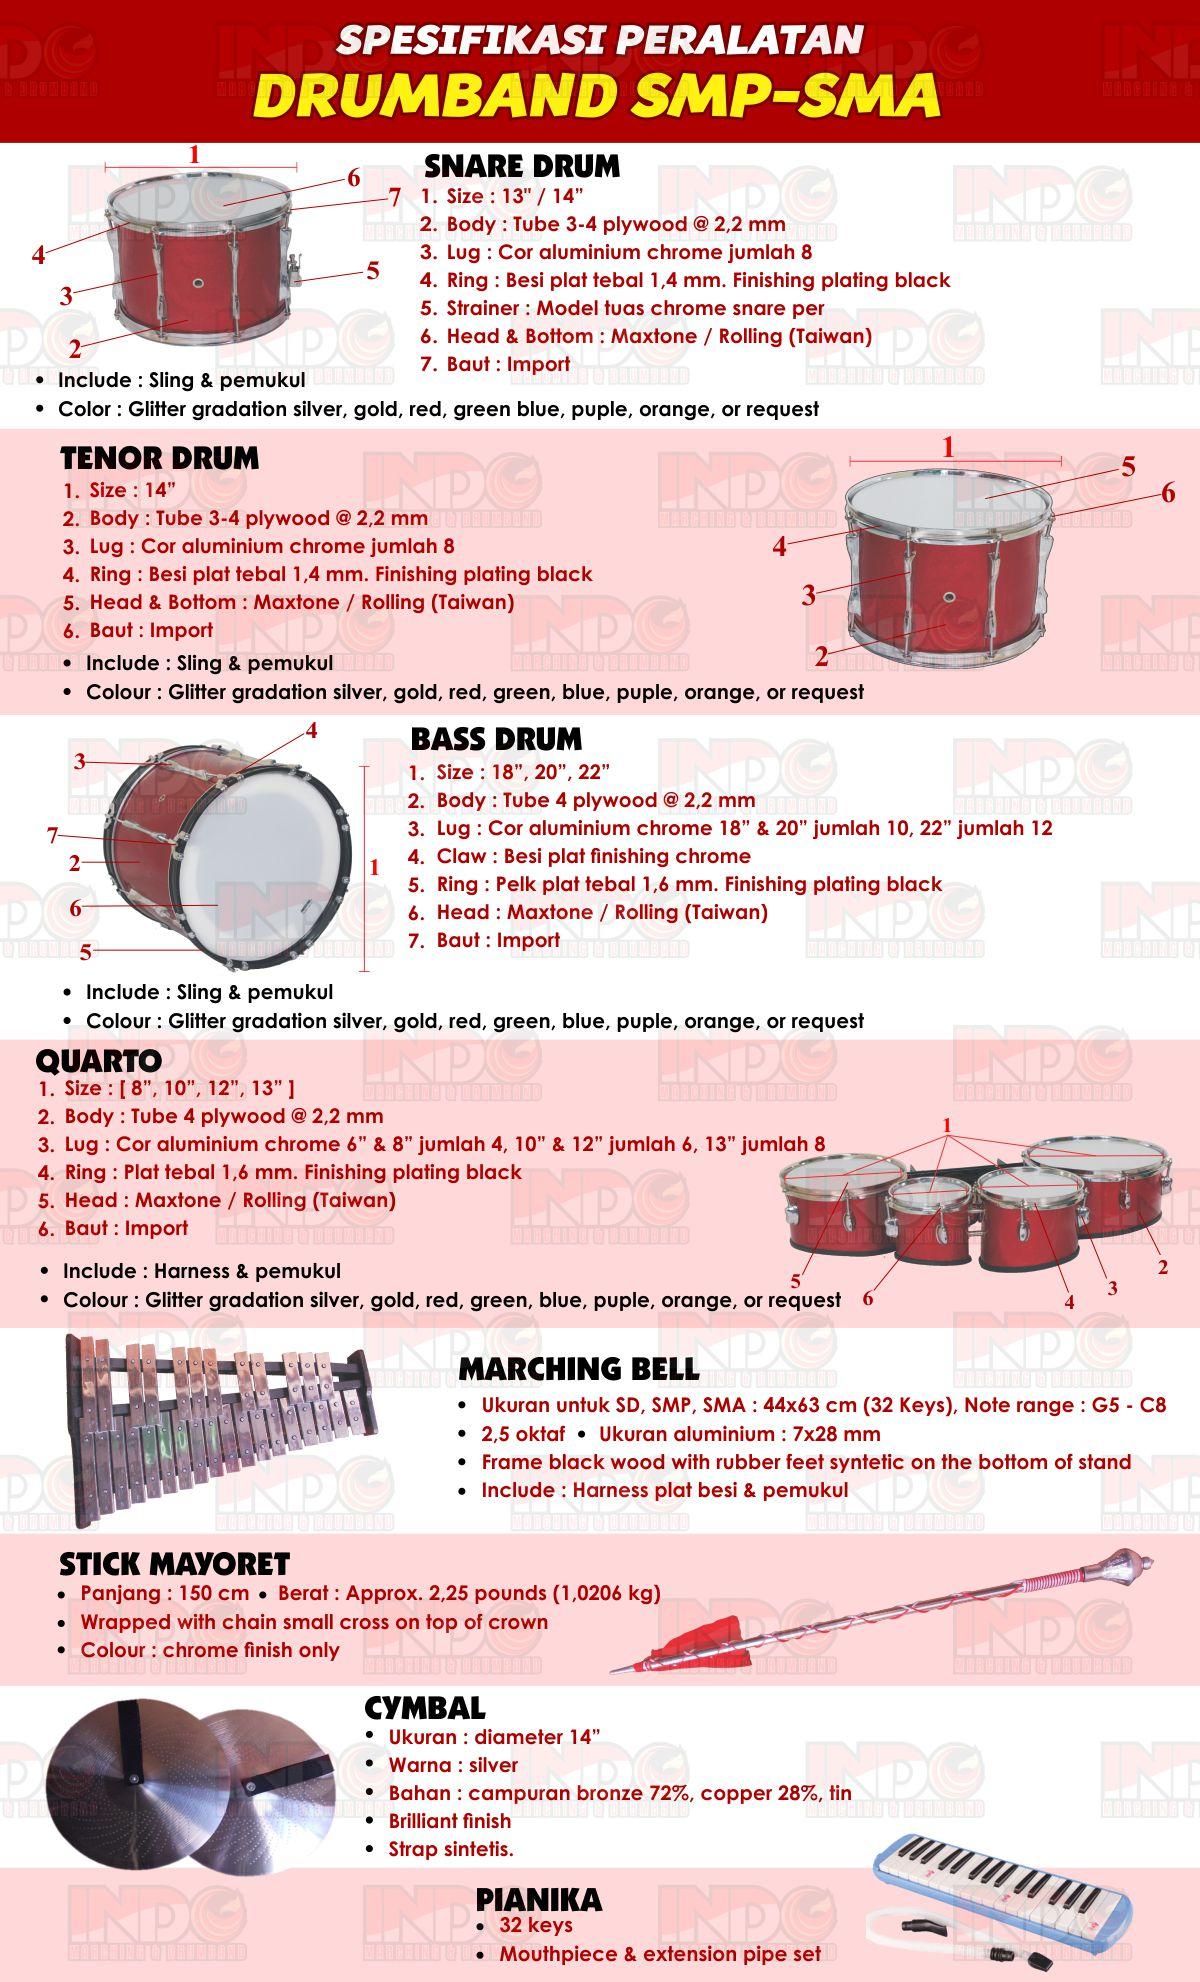 03 Spesifikasi Drumband SMP-SMA